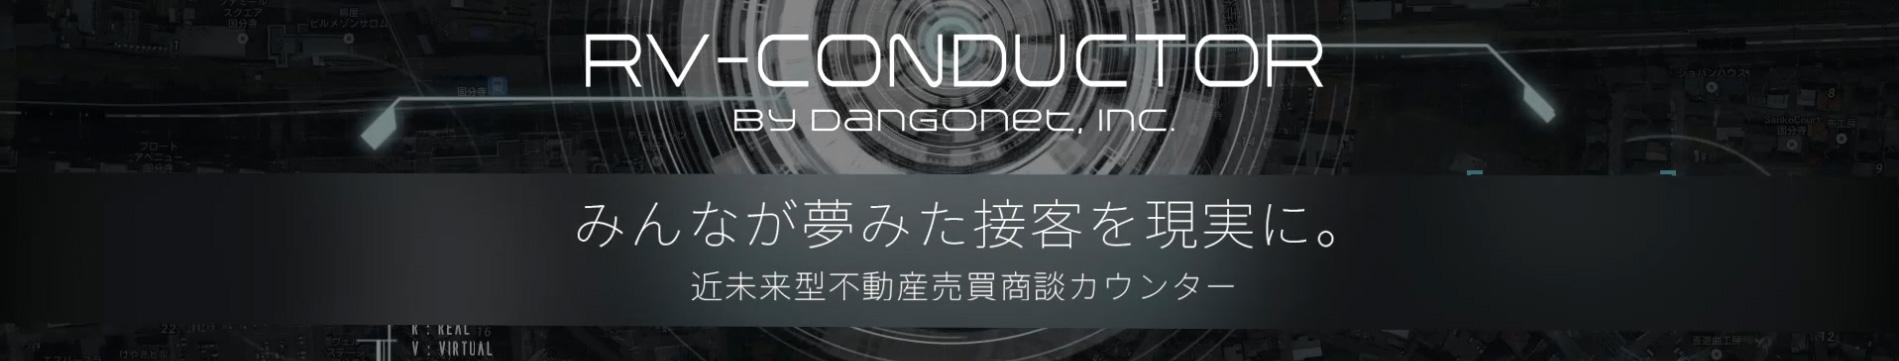 RV-CONDUCTORならスマホと同じ直感的な操作で住まいの情報をお客様にご提供